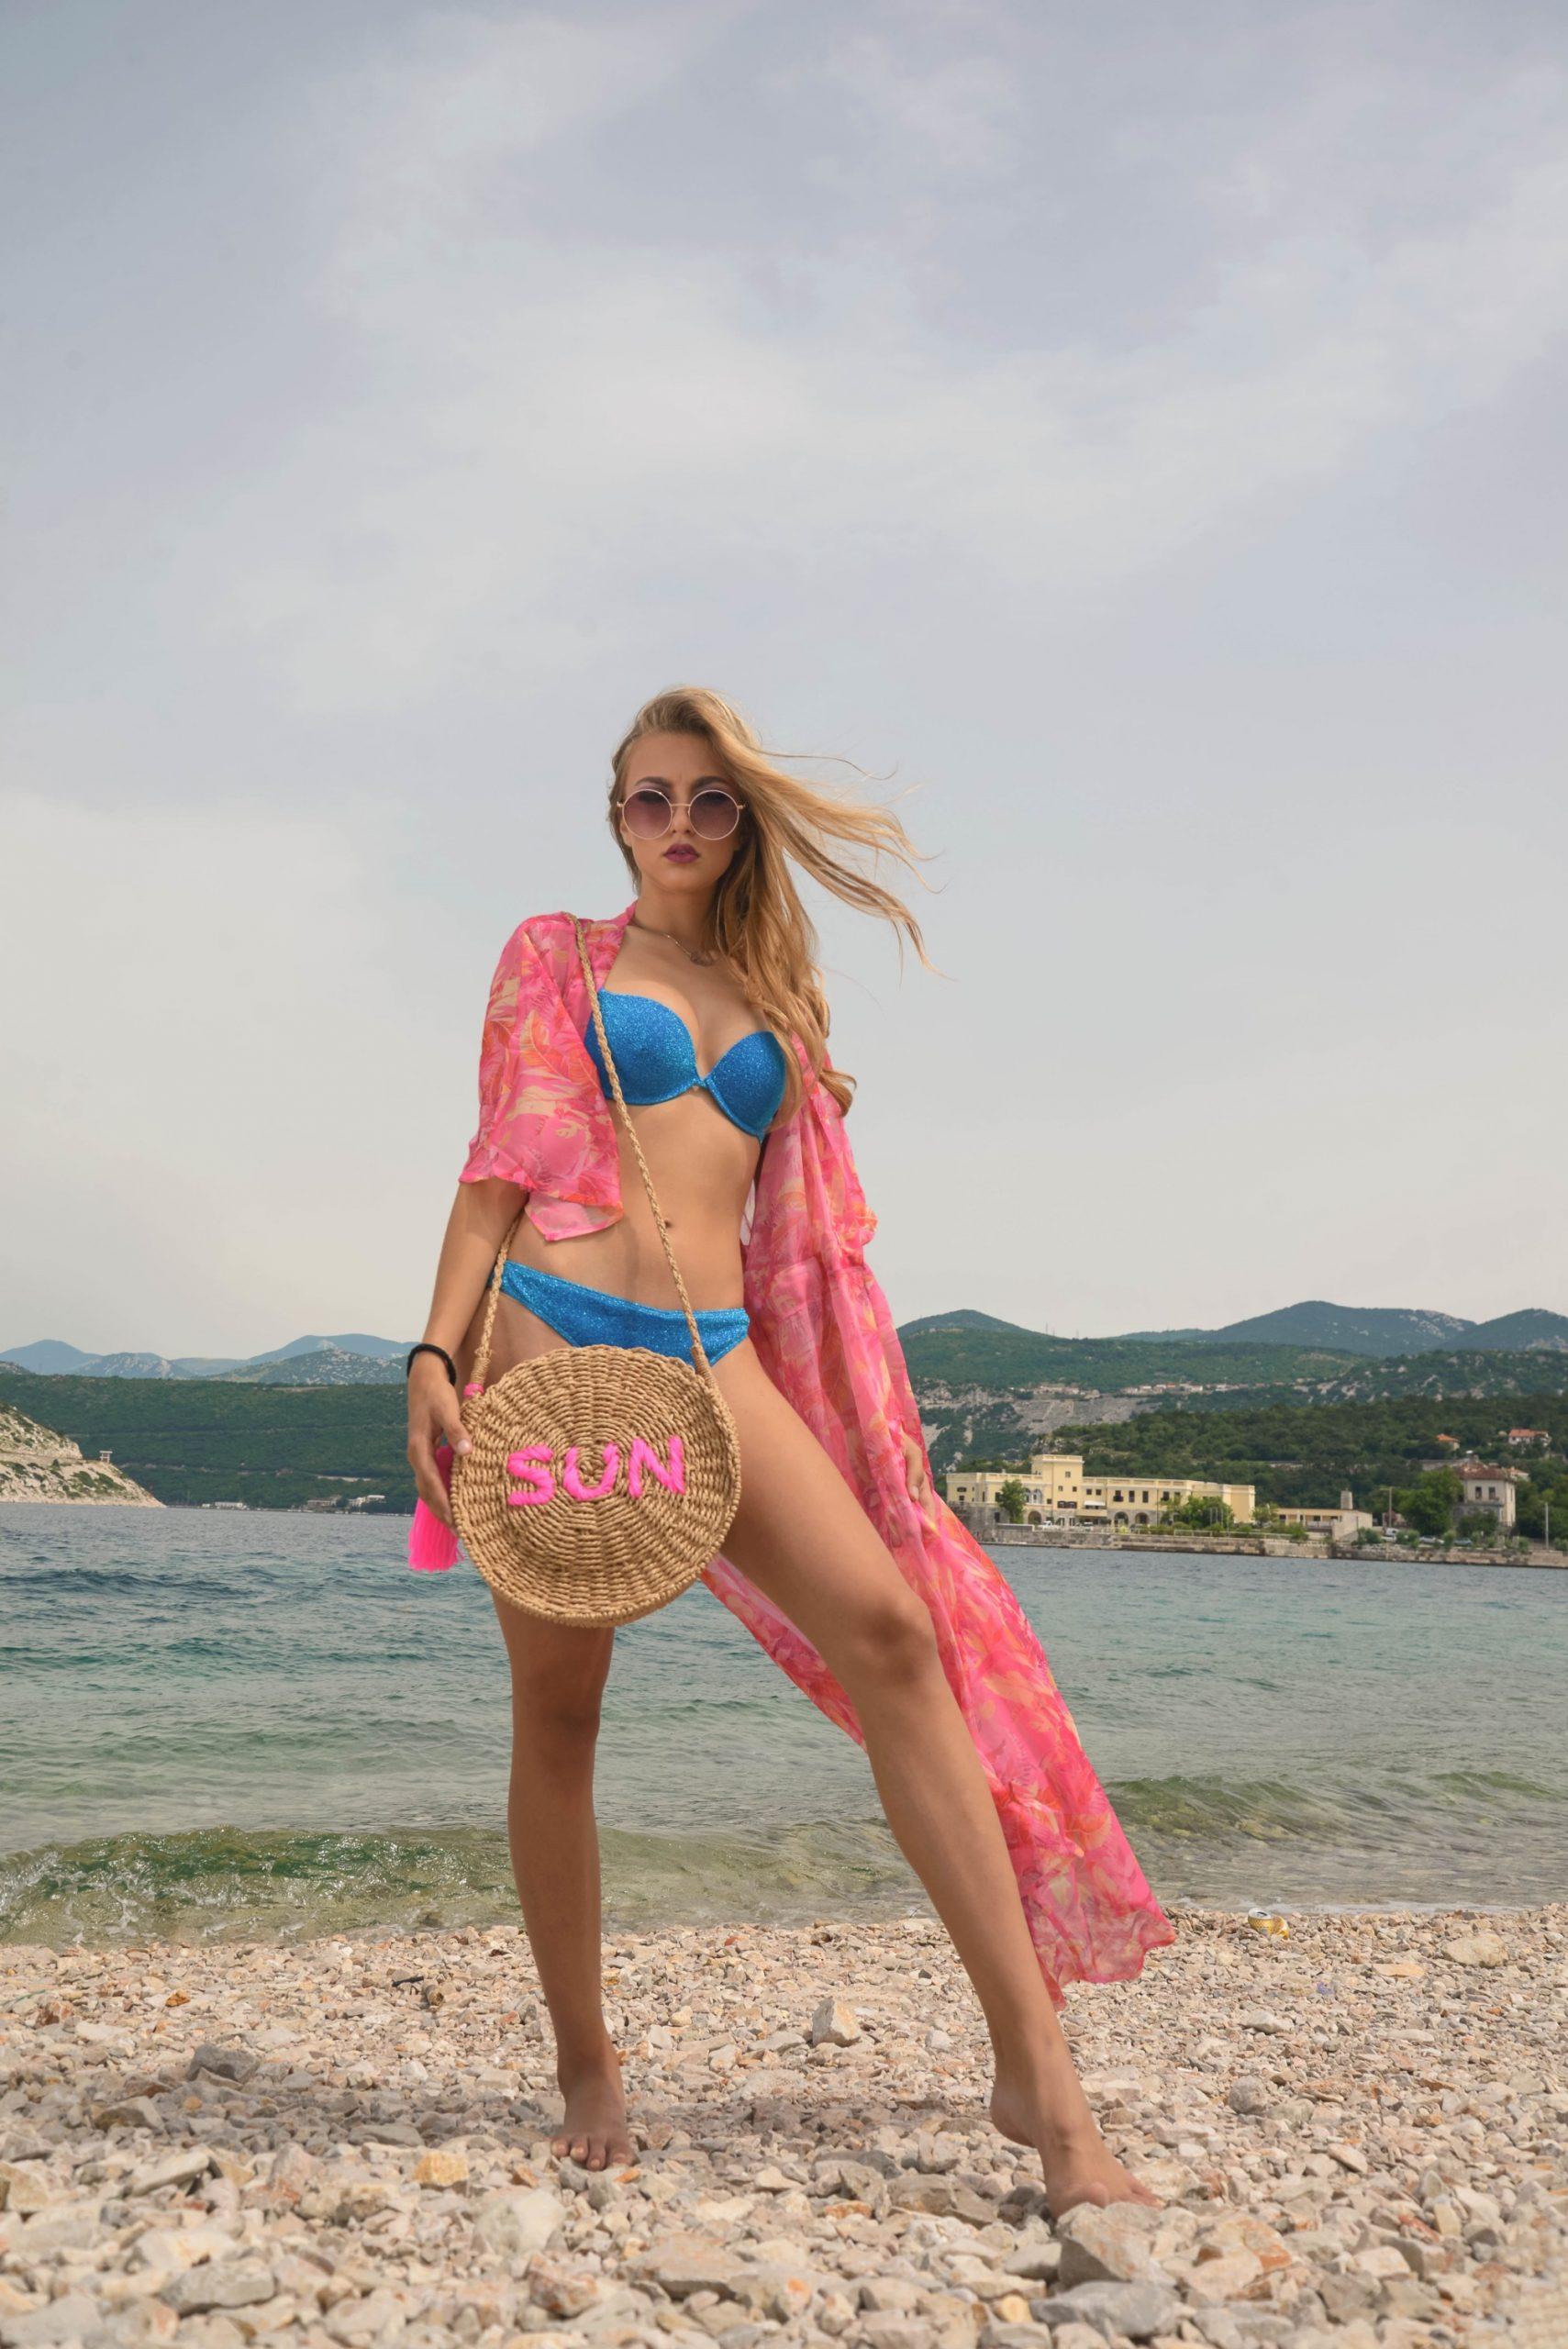 Extravagant editorijal: Summer by ZTC